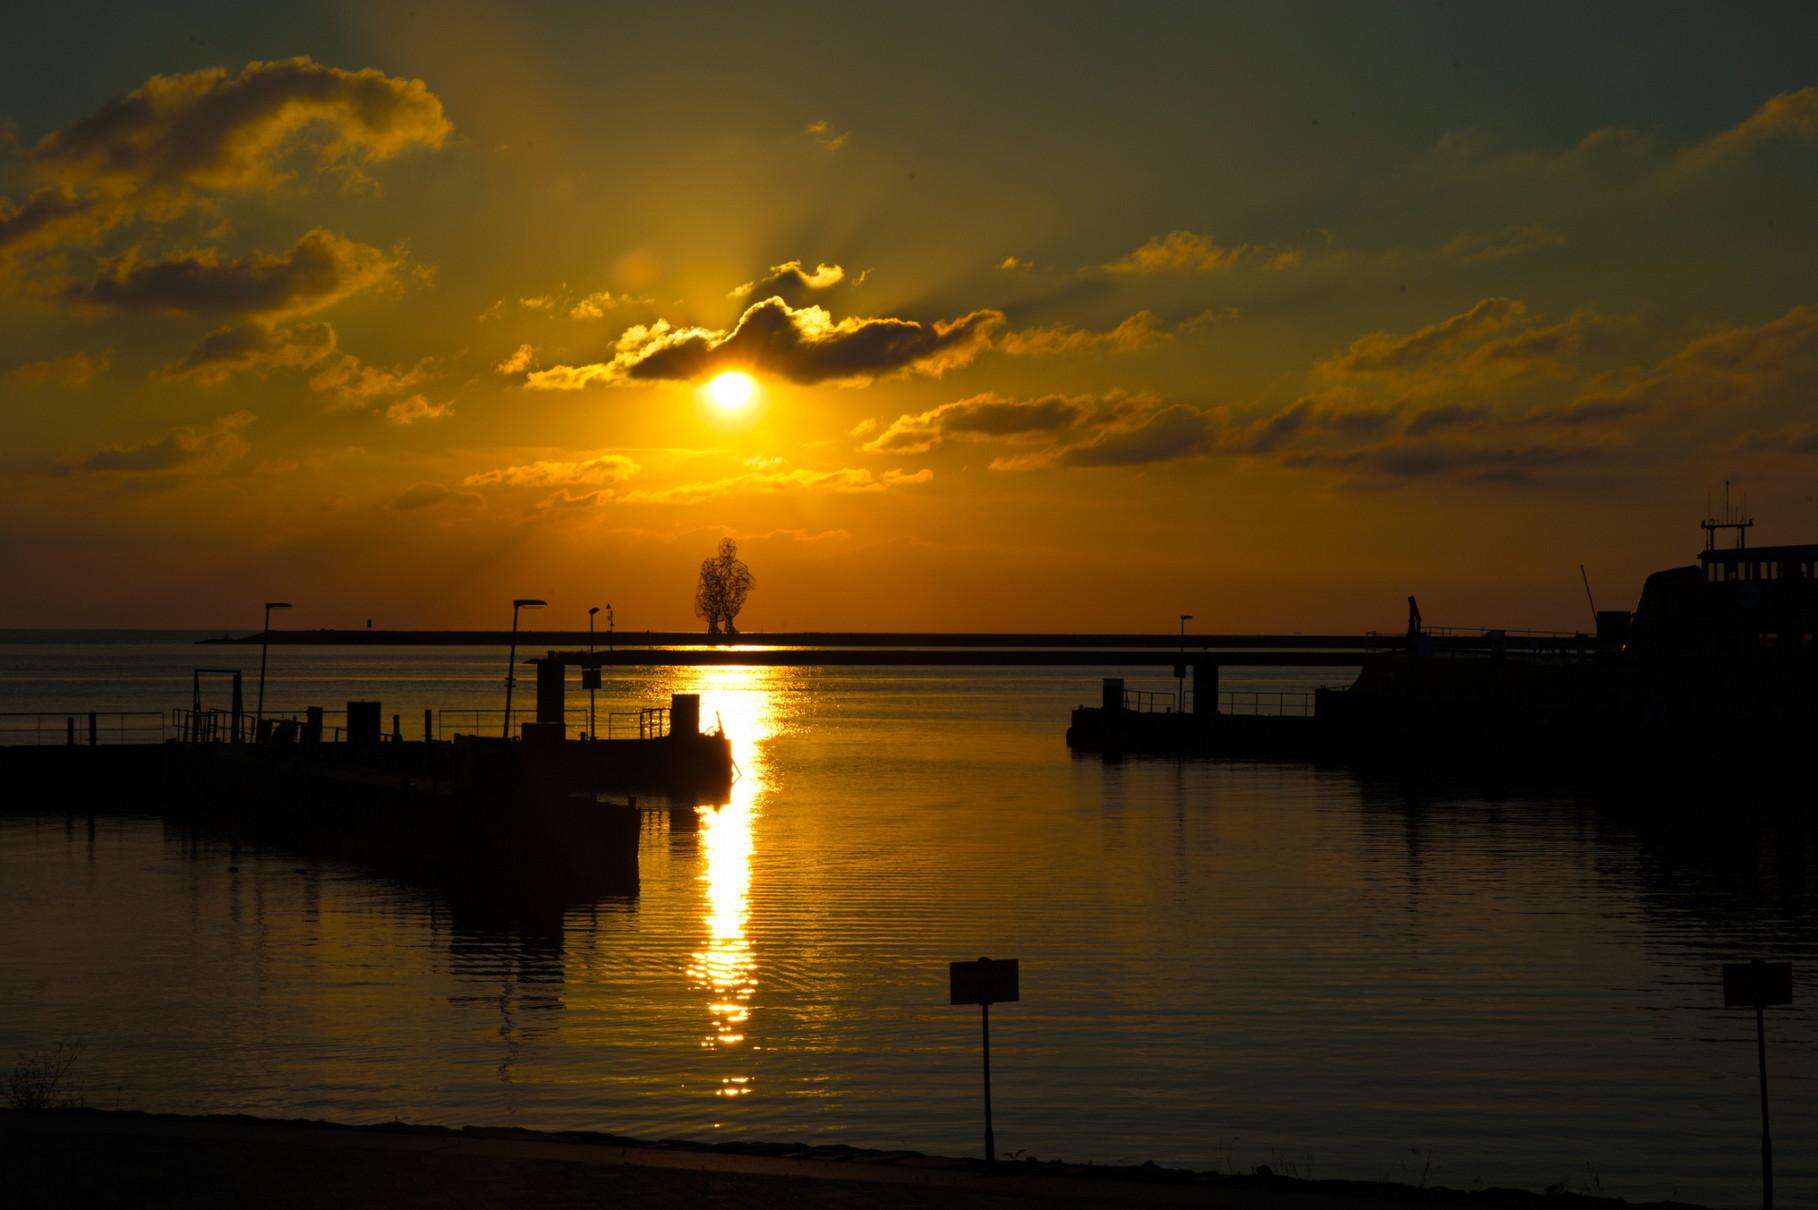 Lelystad, Ijsselmeer, Holland, Wasser, Segeln, Urlaub, Mies Vandenbergh Fotografie